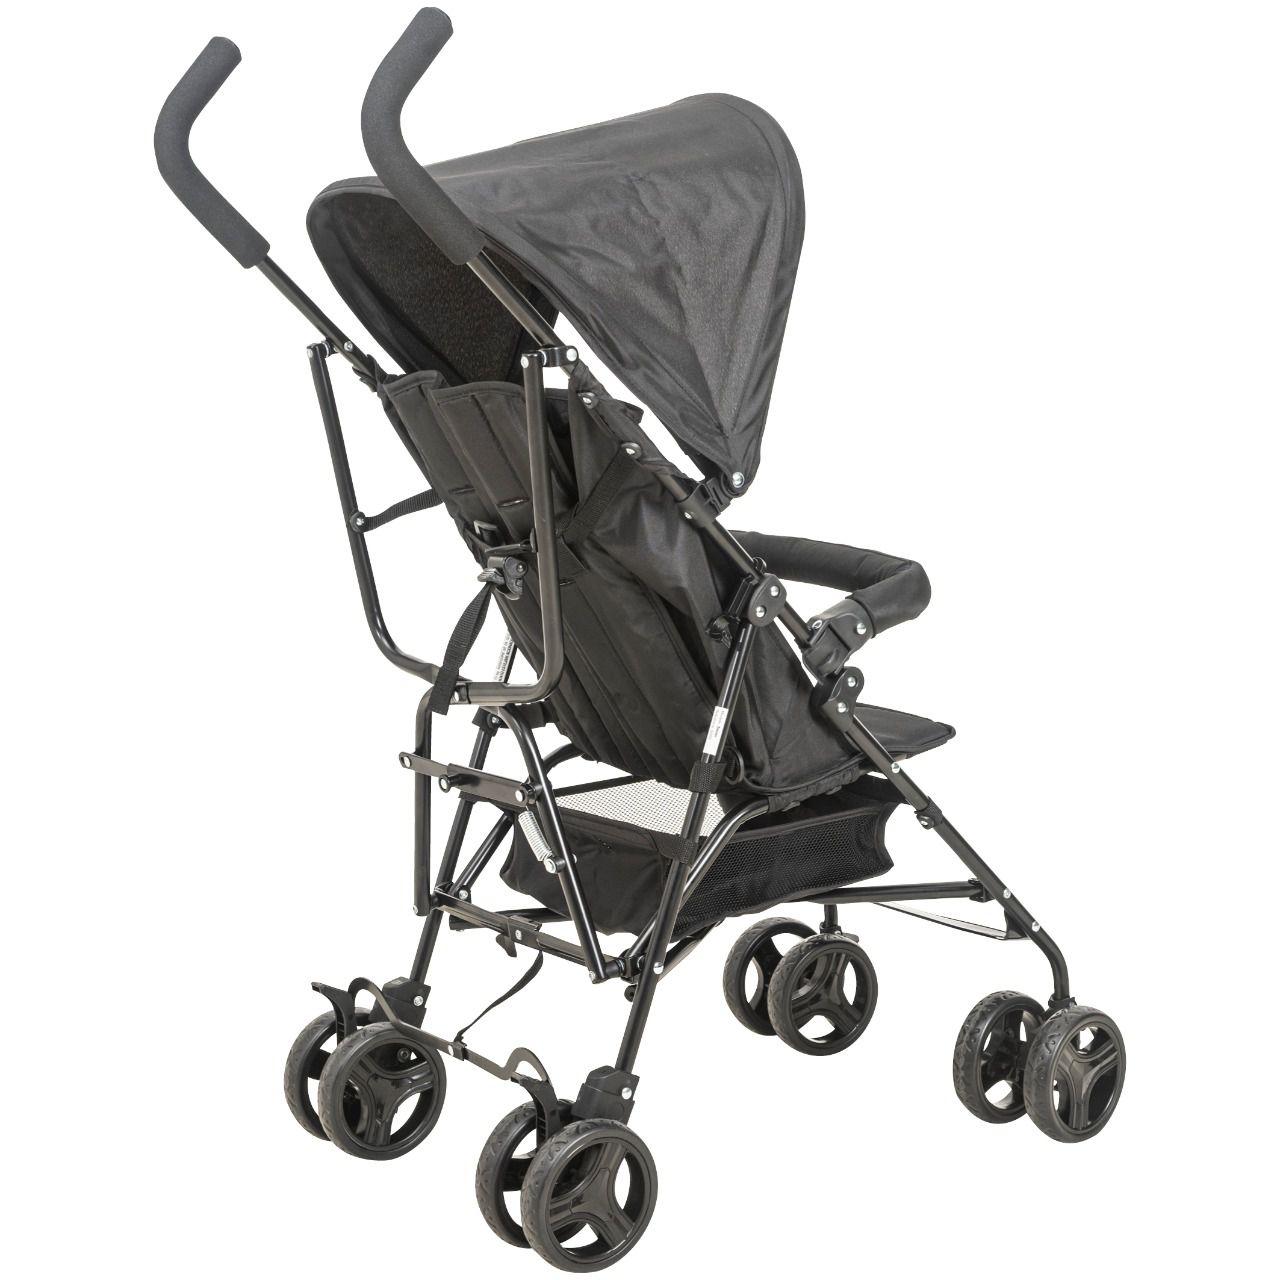 Carrinho de Bebê Passeio Torino Fechamento Guarda-Chuva Kiddo Whoop